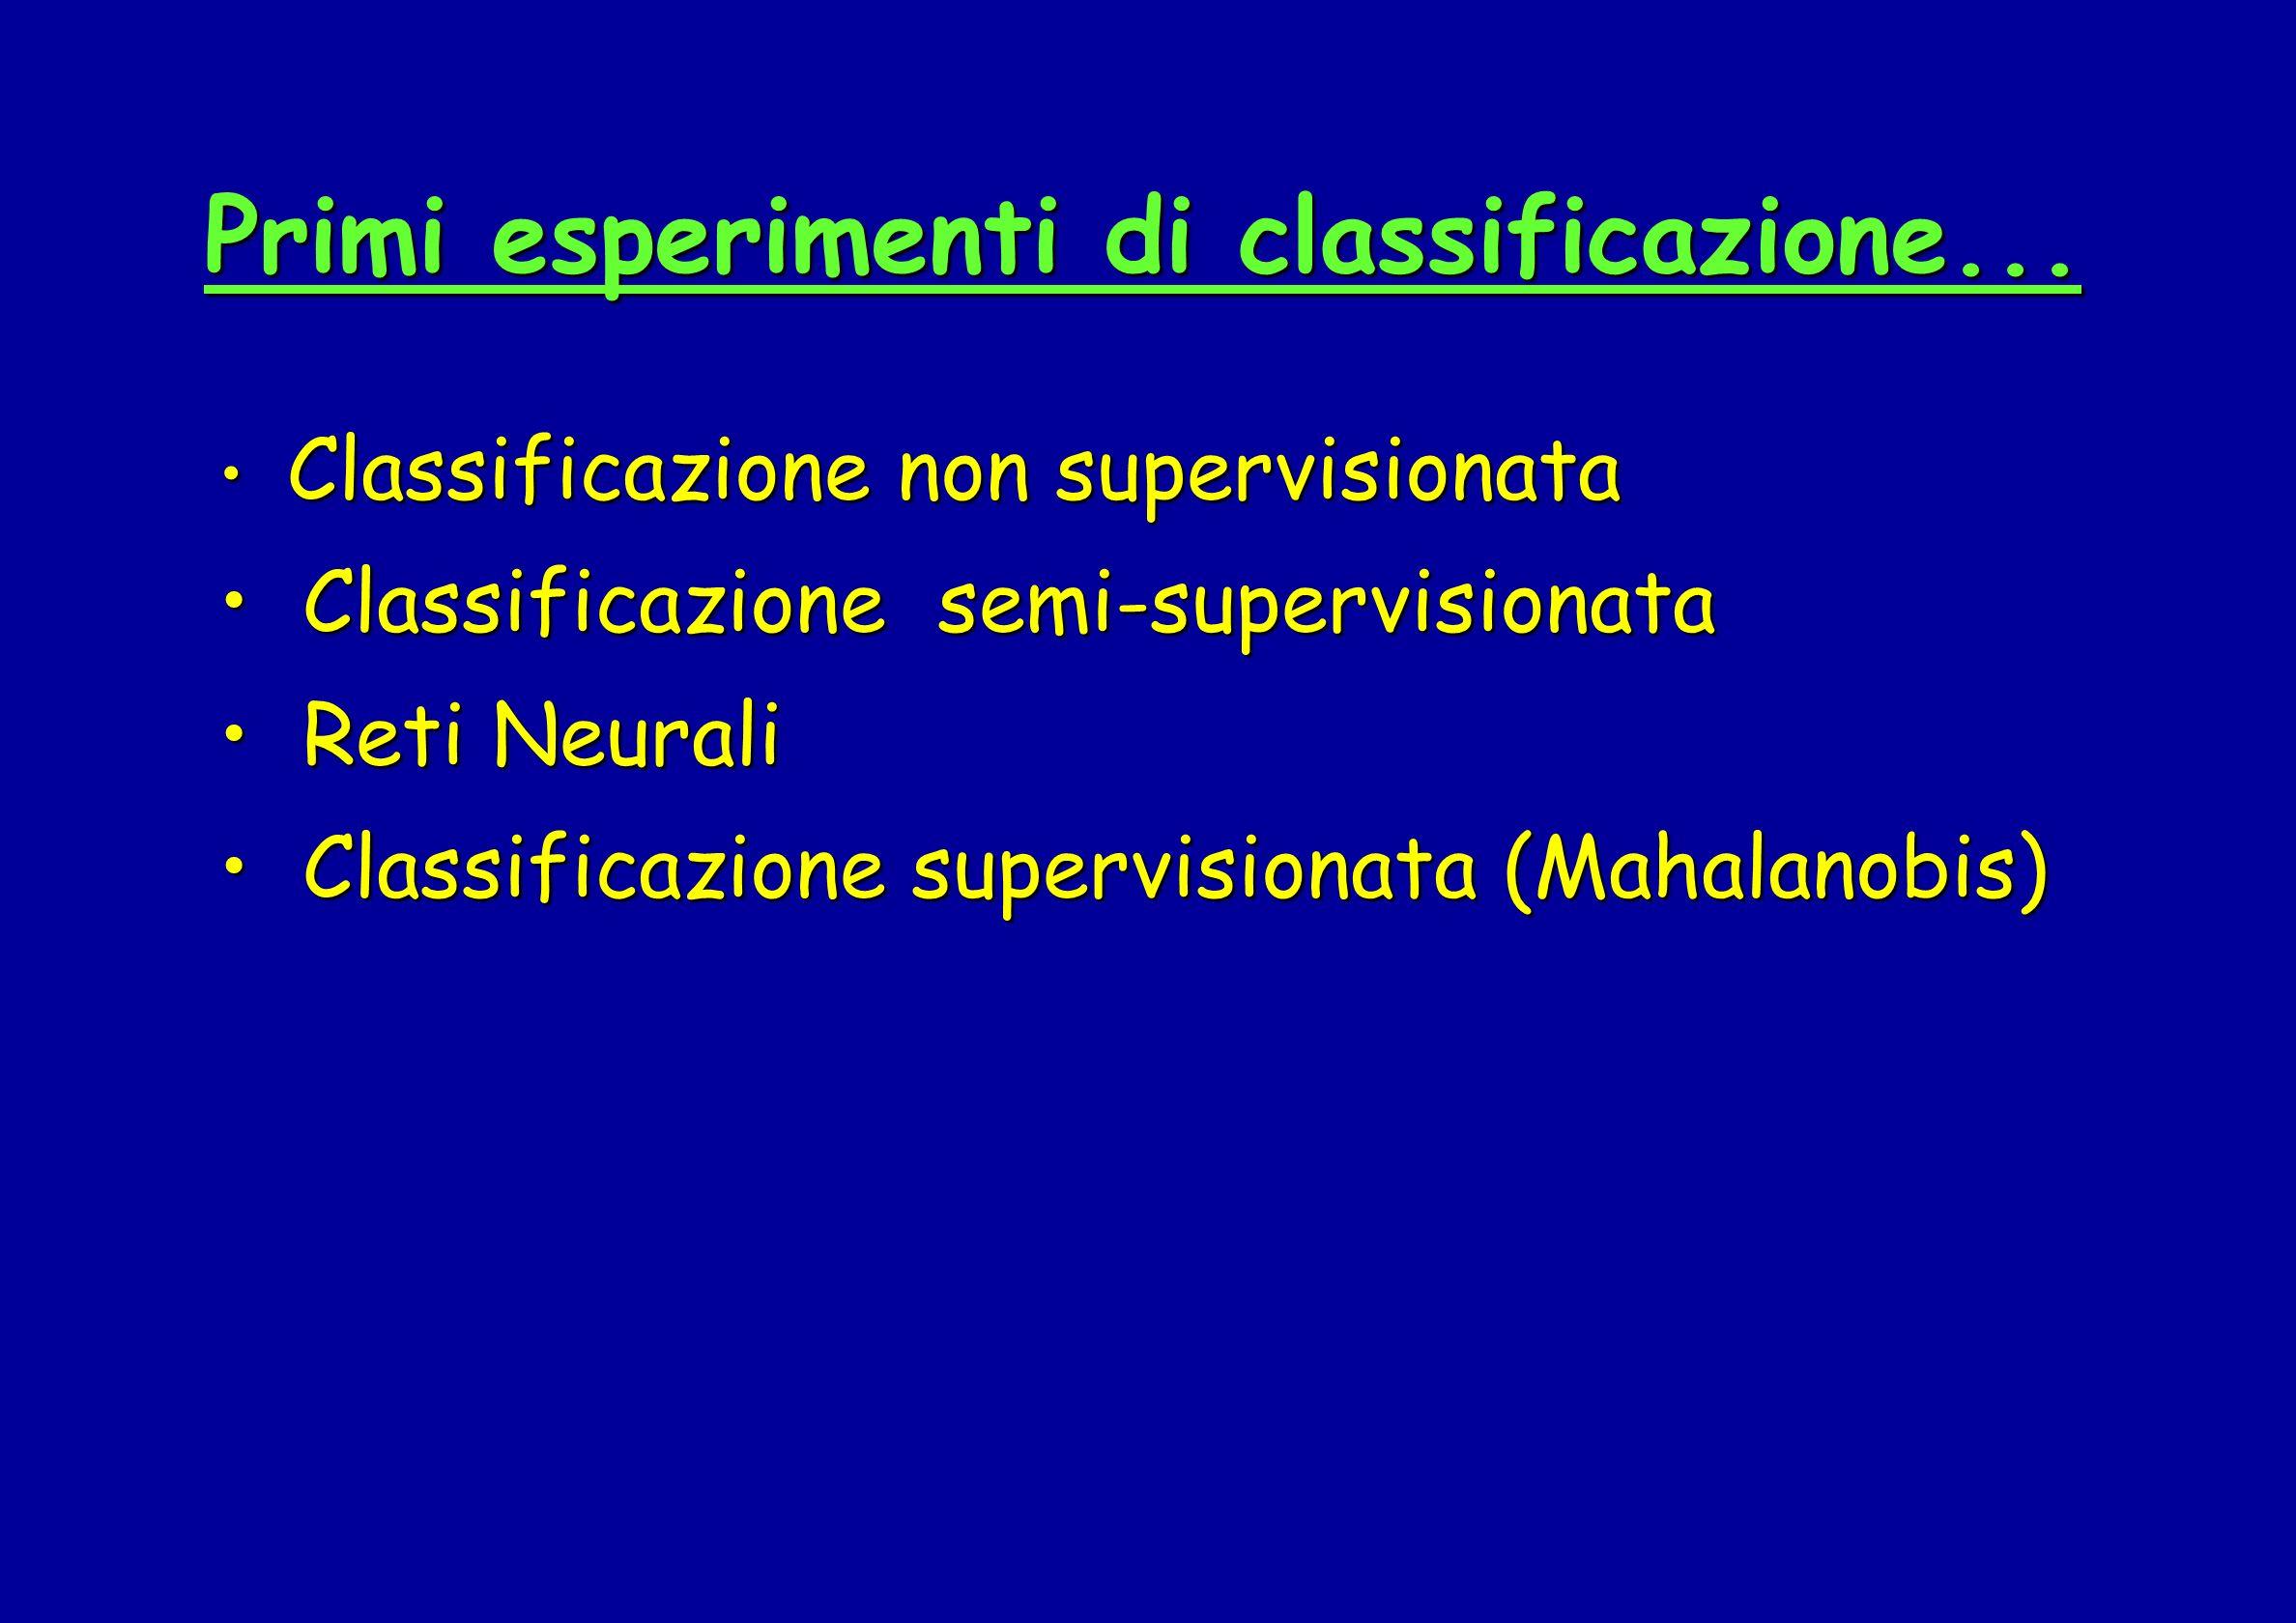 Primi esperimenti di classificazione...